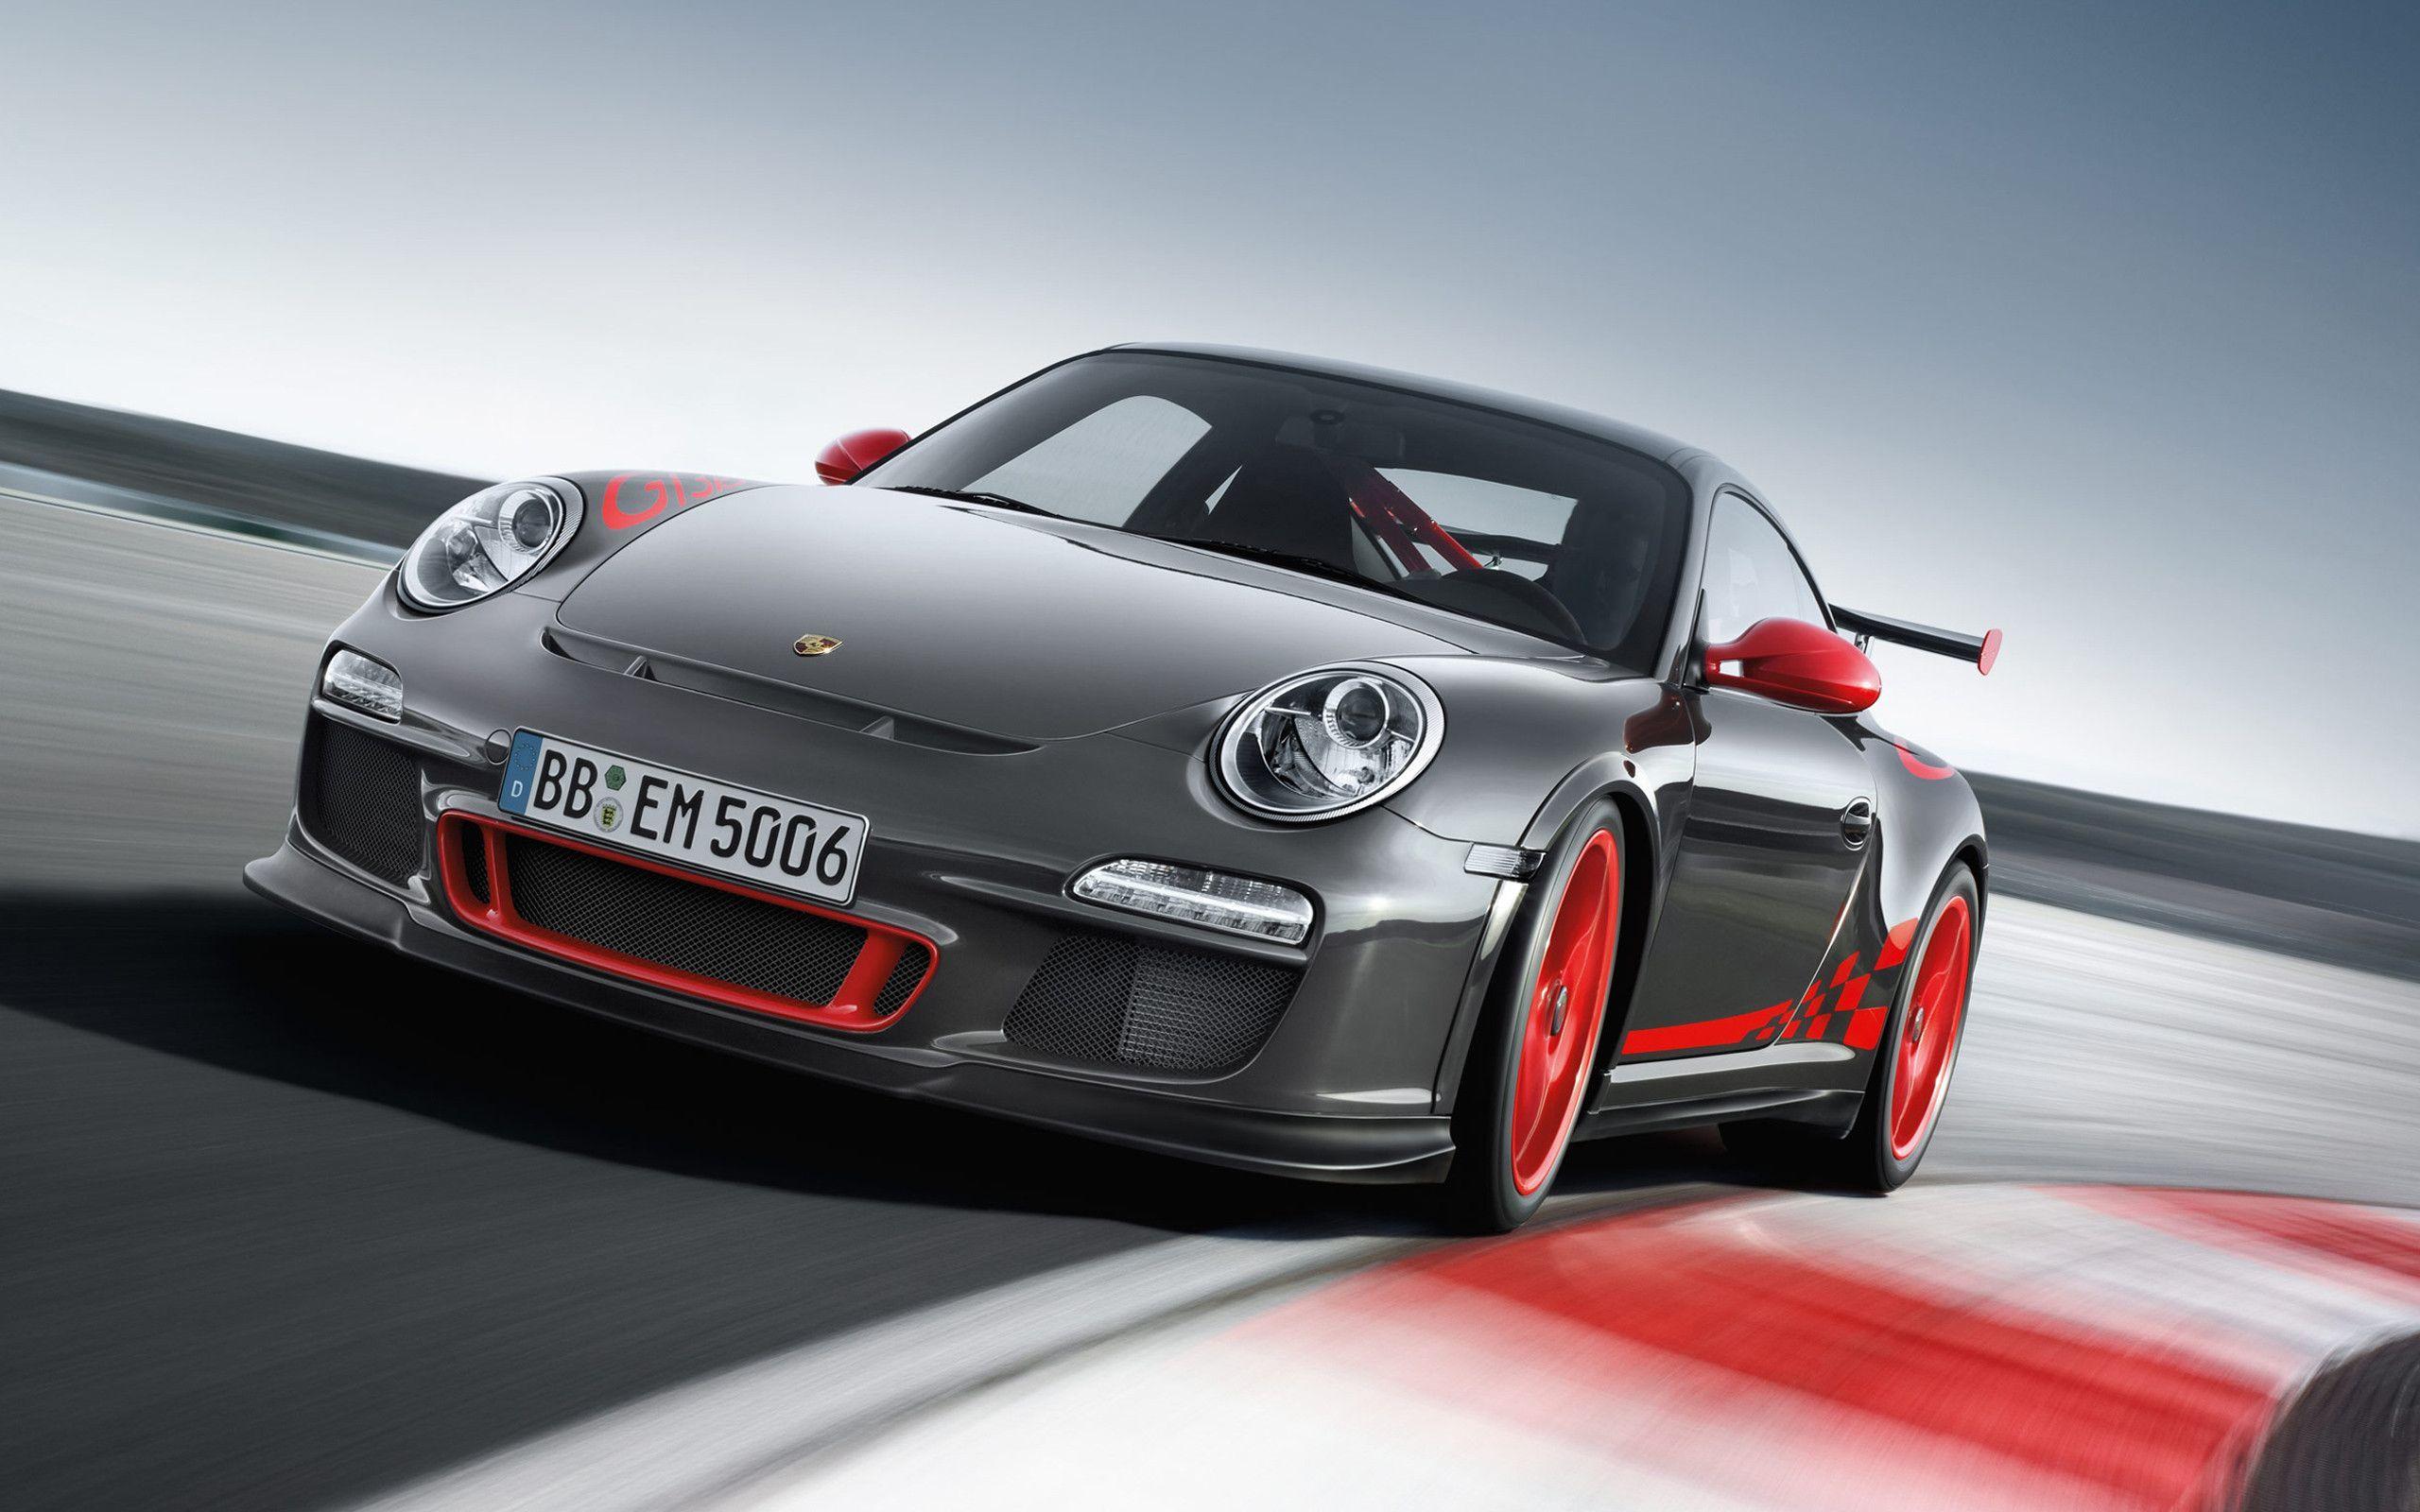 Porsche Wallpaper Photo Di0 2560 X 1600 Px 1 2 Mb Gt3 Logo Iphone Turbo Porsche Porsche 911 Gt3 Porsche Gt3